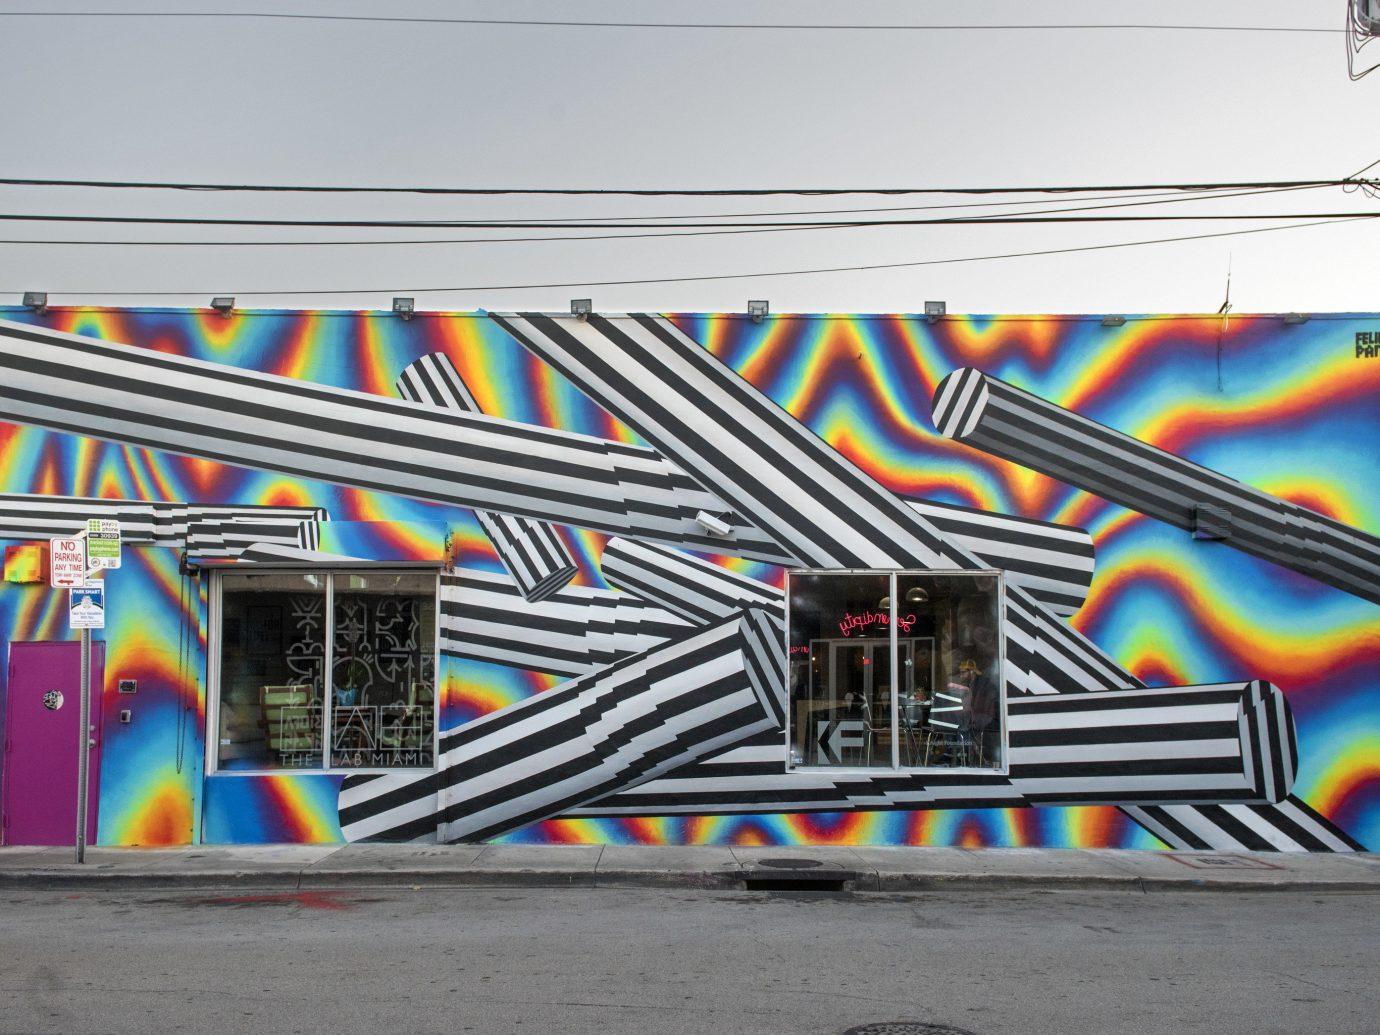 Trip Ideas color graffiti art mural colorful street street art colored